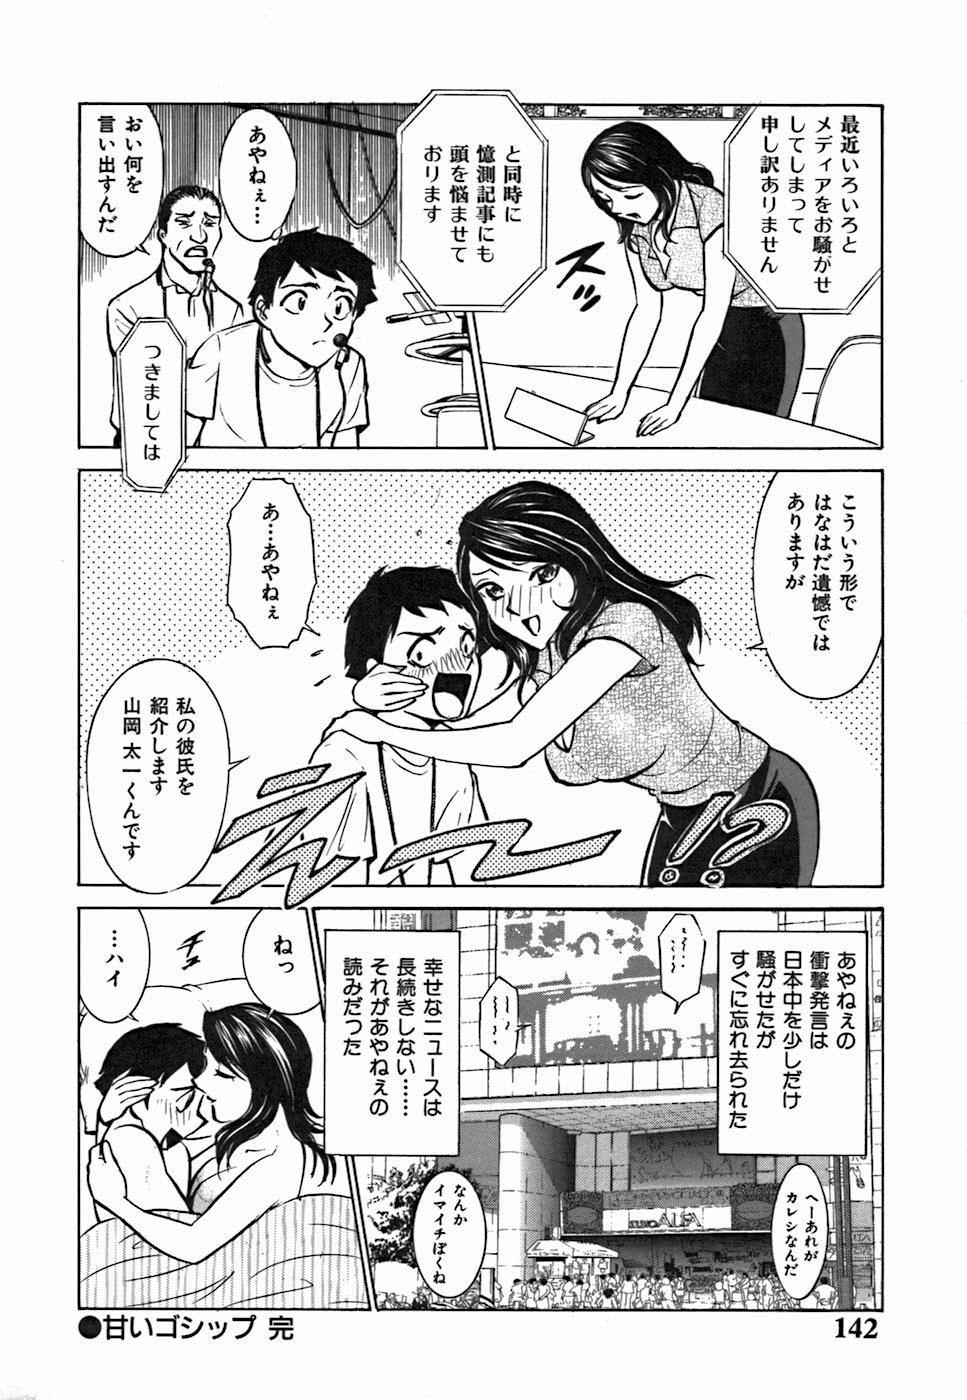 Kimi ga Nozomu Katachi | Appearance for which you hope 141